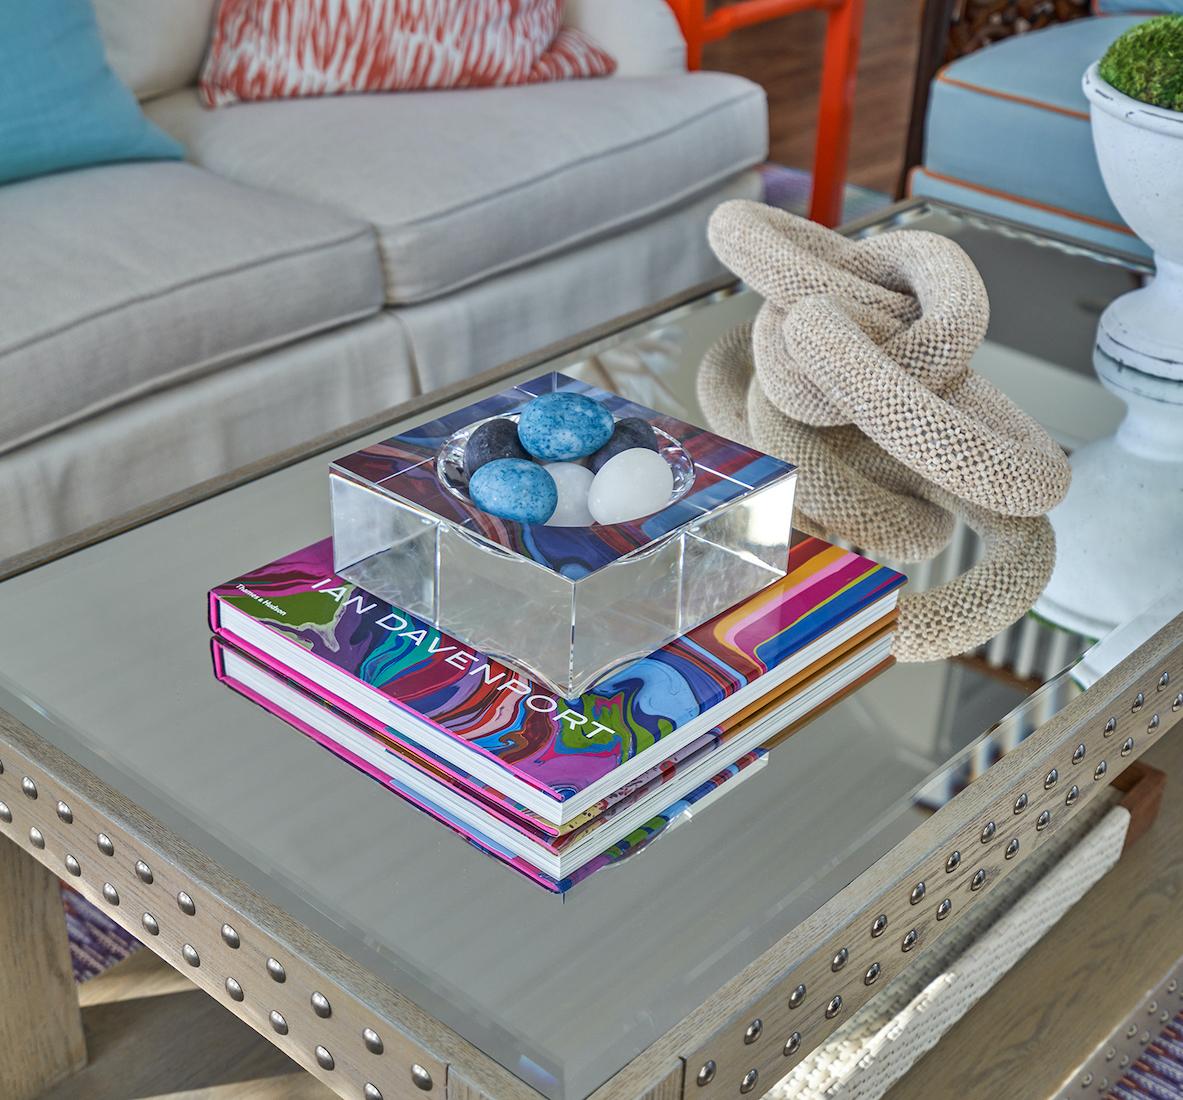 ourdoor-patio-table-accessories-interior-design